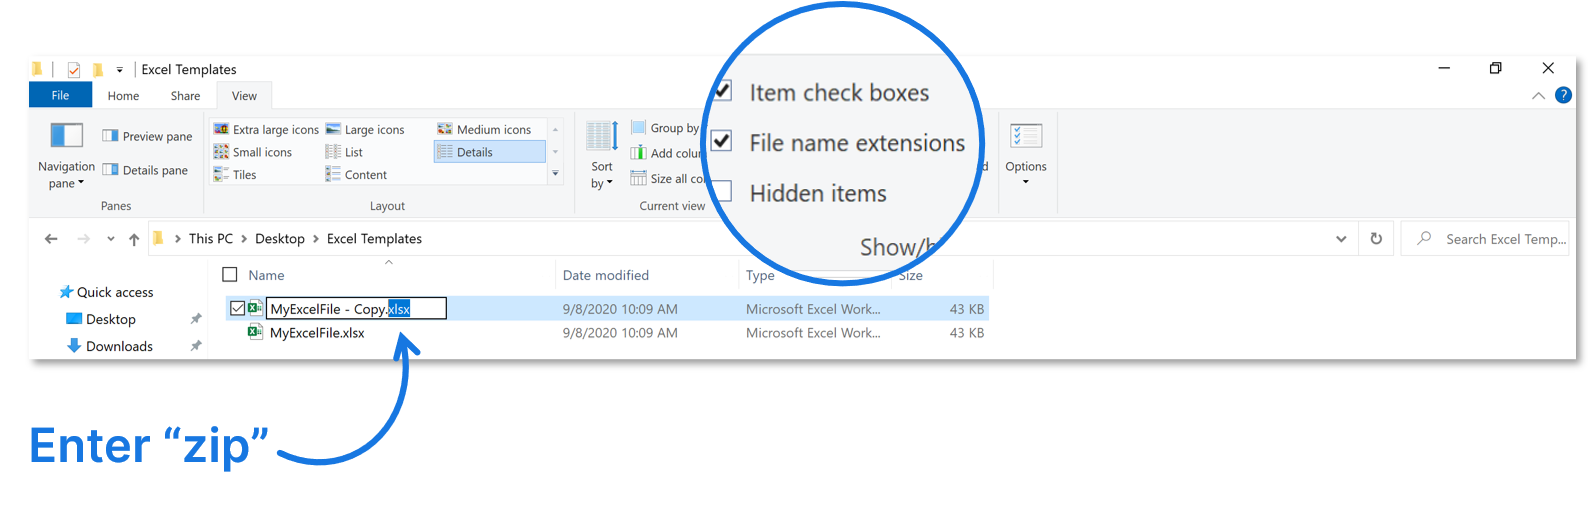 reduce-excel-file-size-zip-format-tip